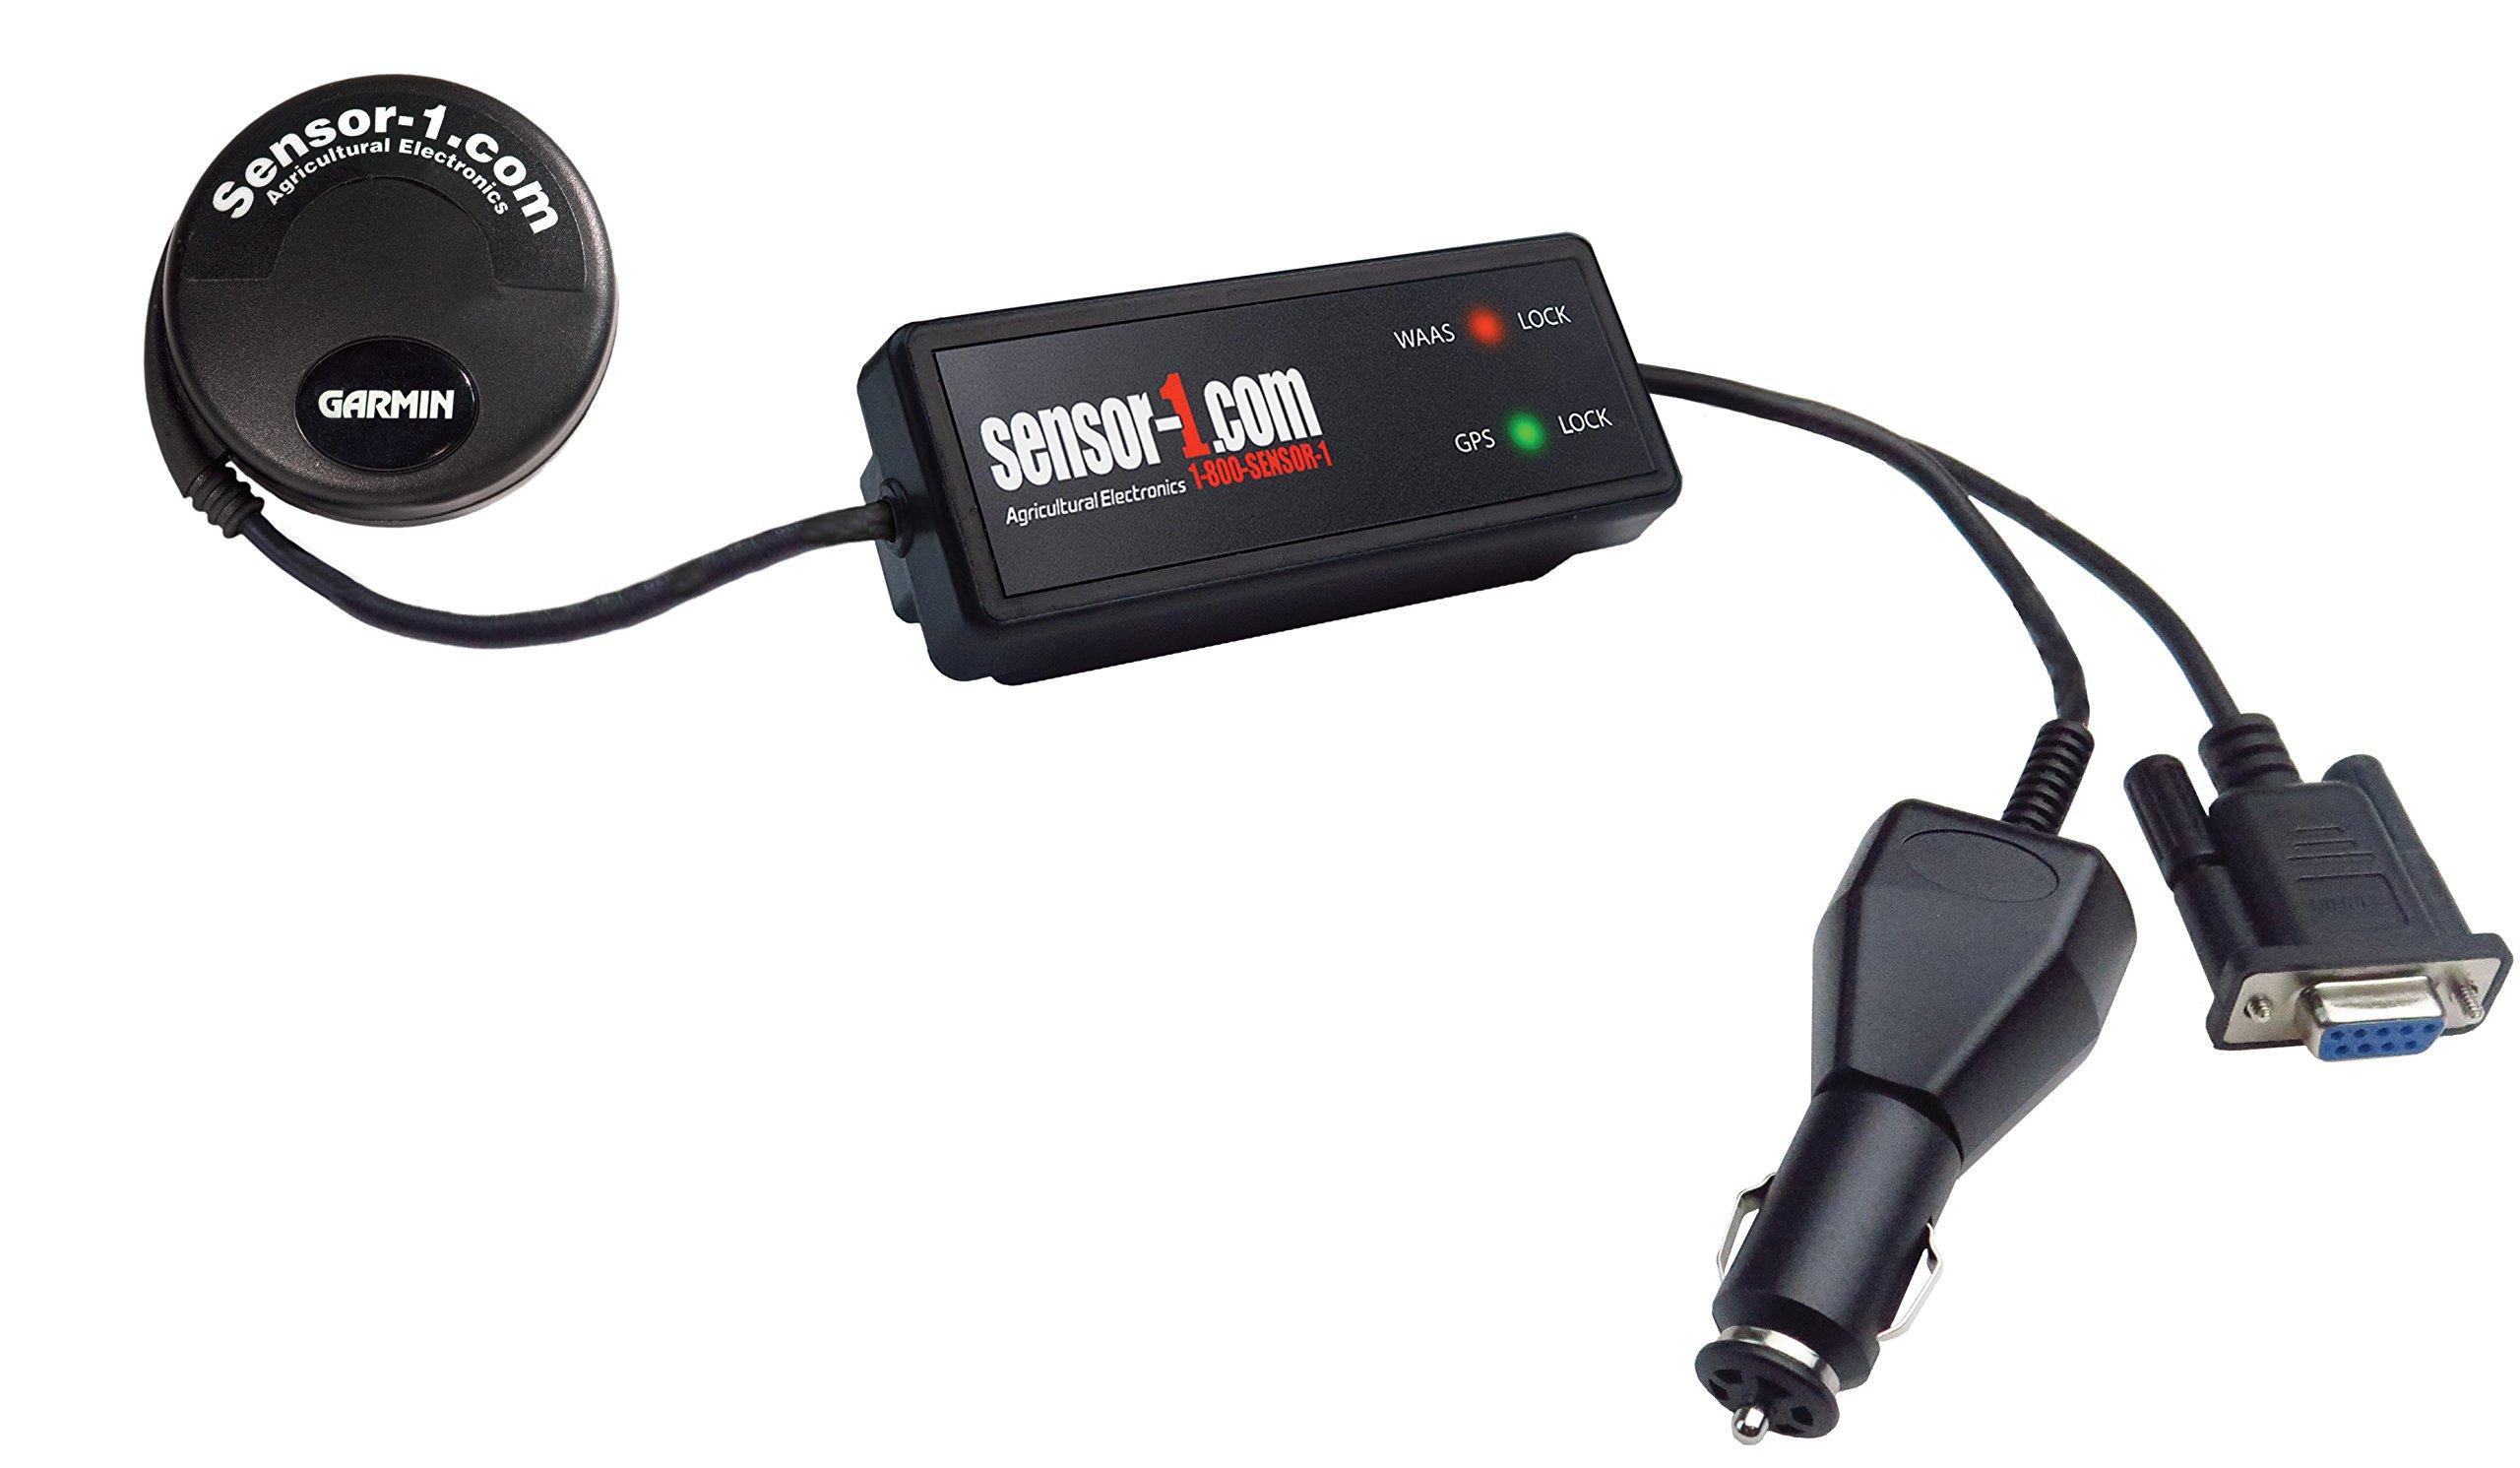 Sensor-1 DS-GVS-DB9F-5 Garmin GPS Mushroom with Garmin GVS Antenna